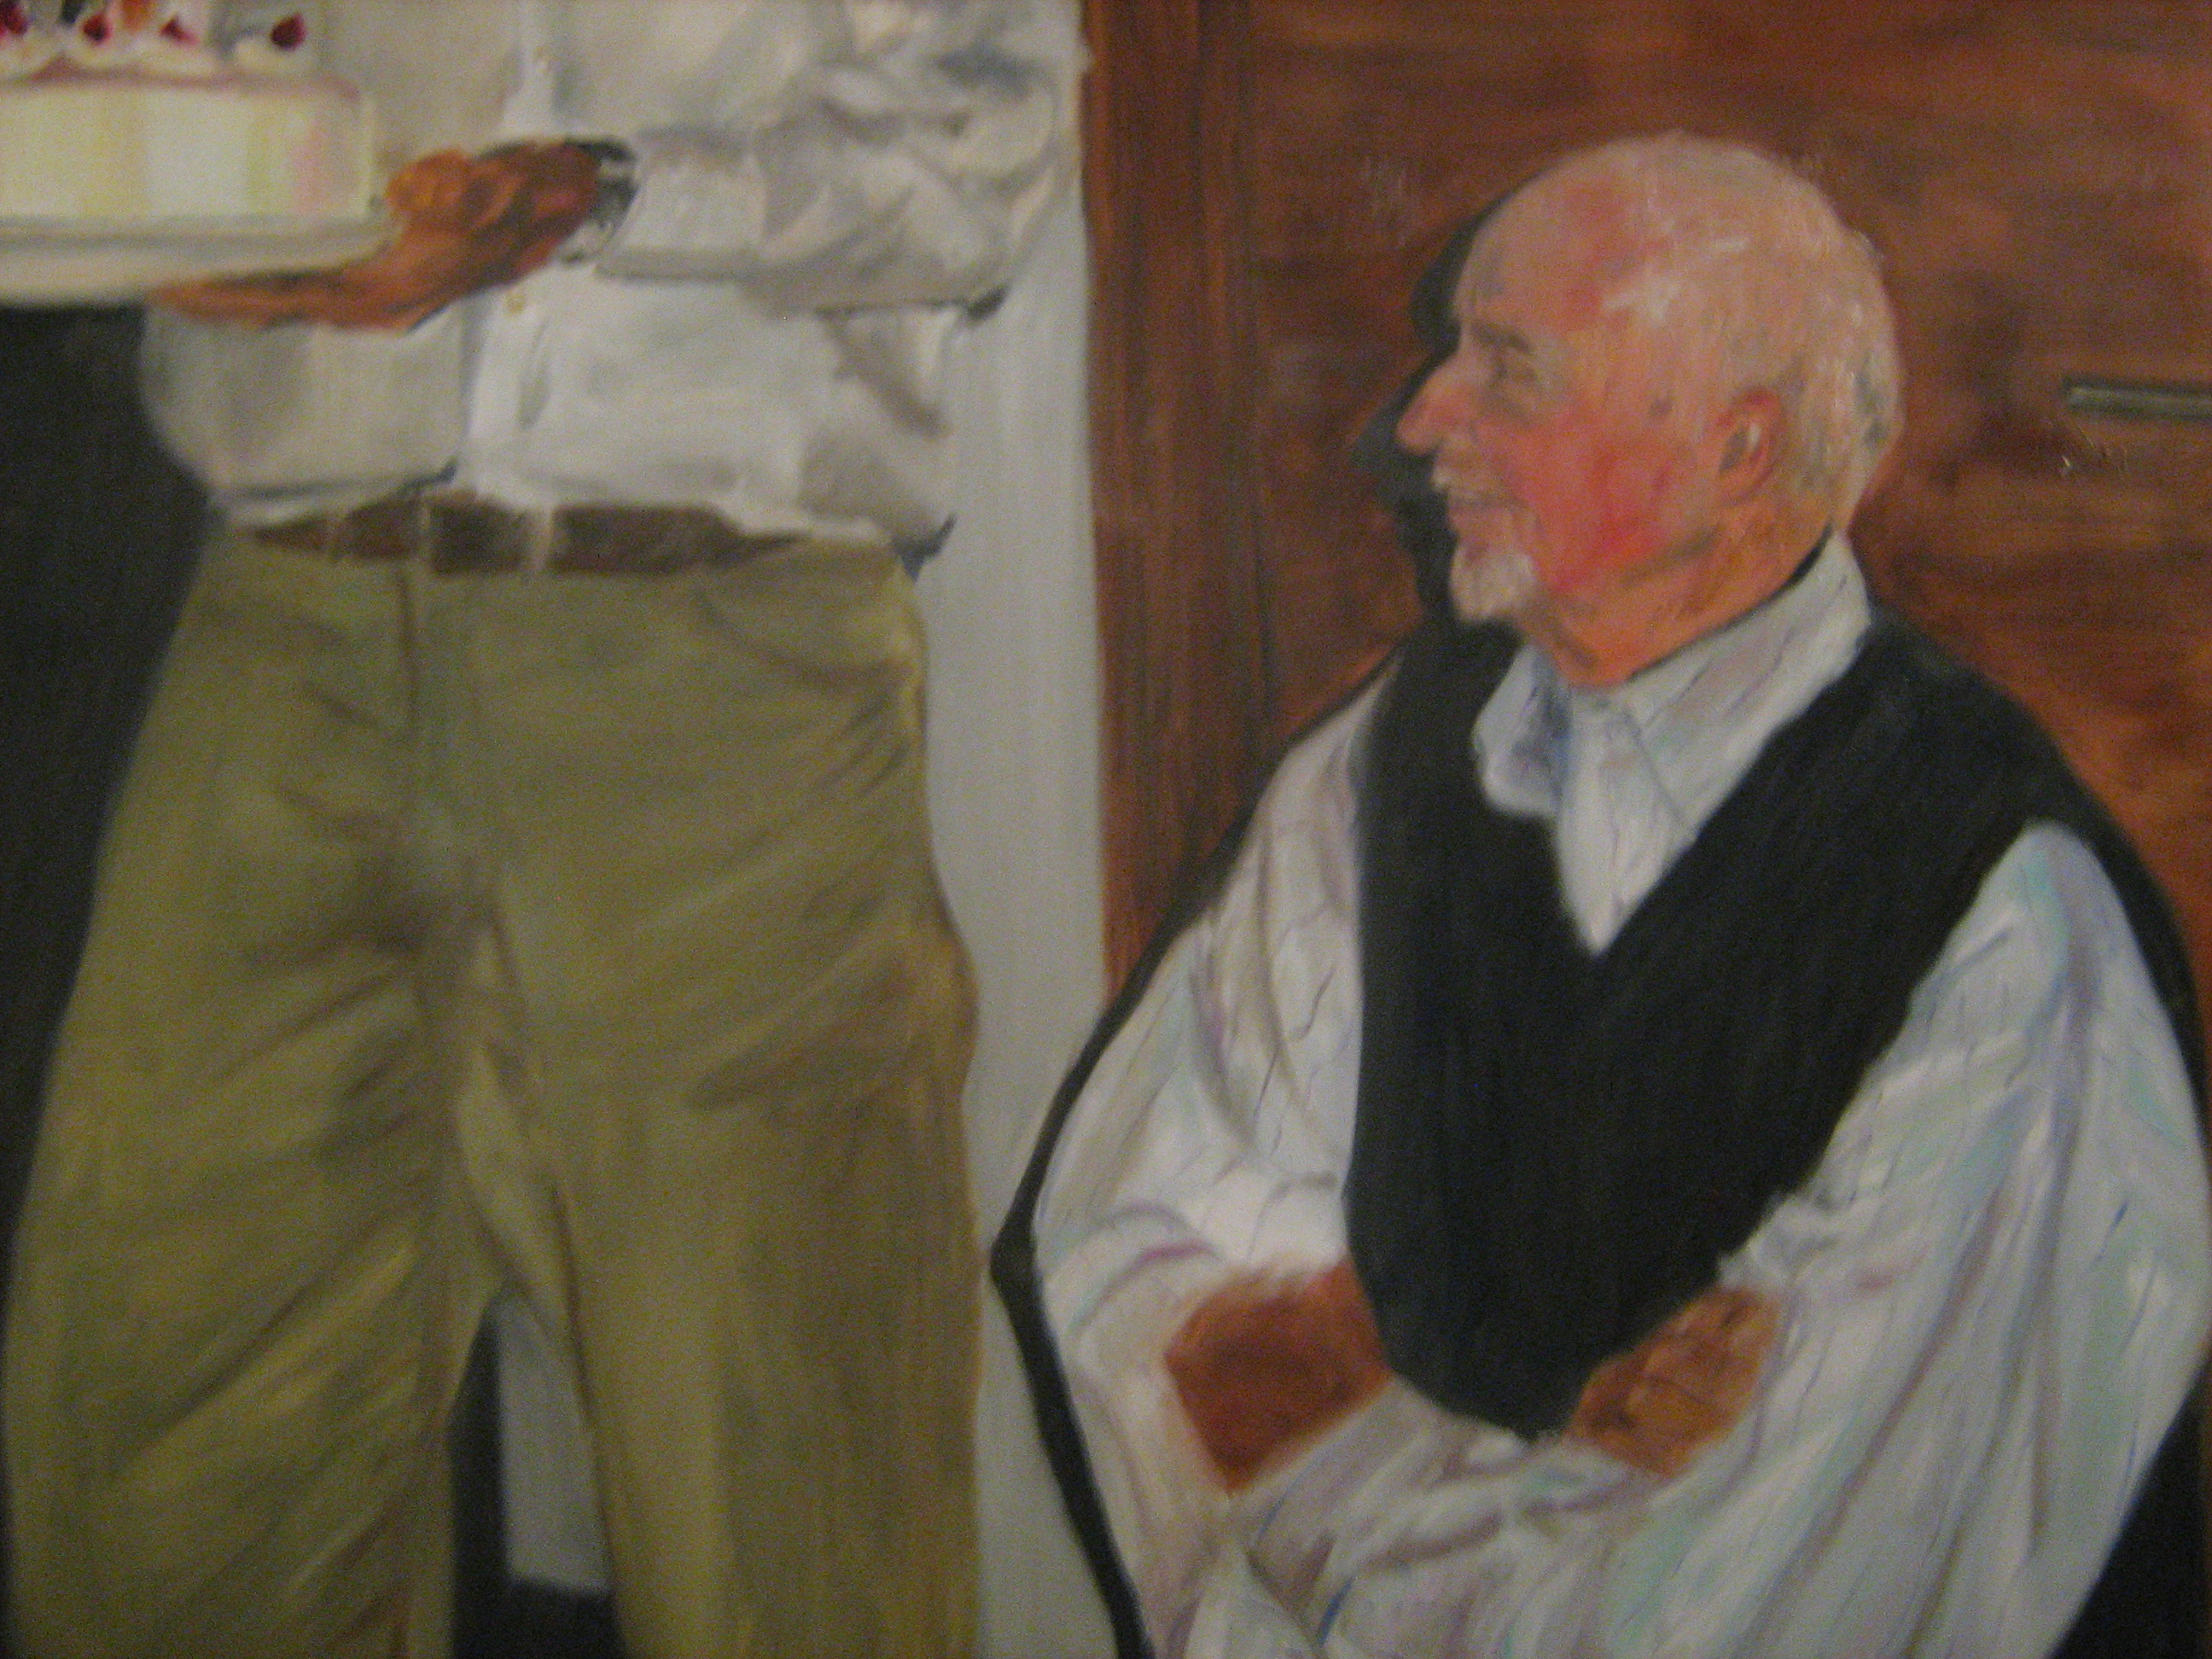 Abuelito Dennis